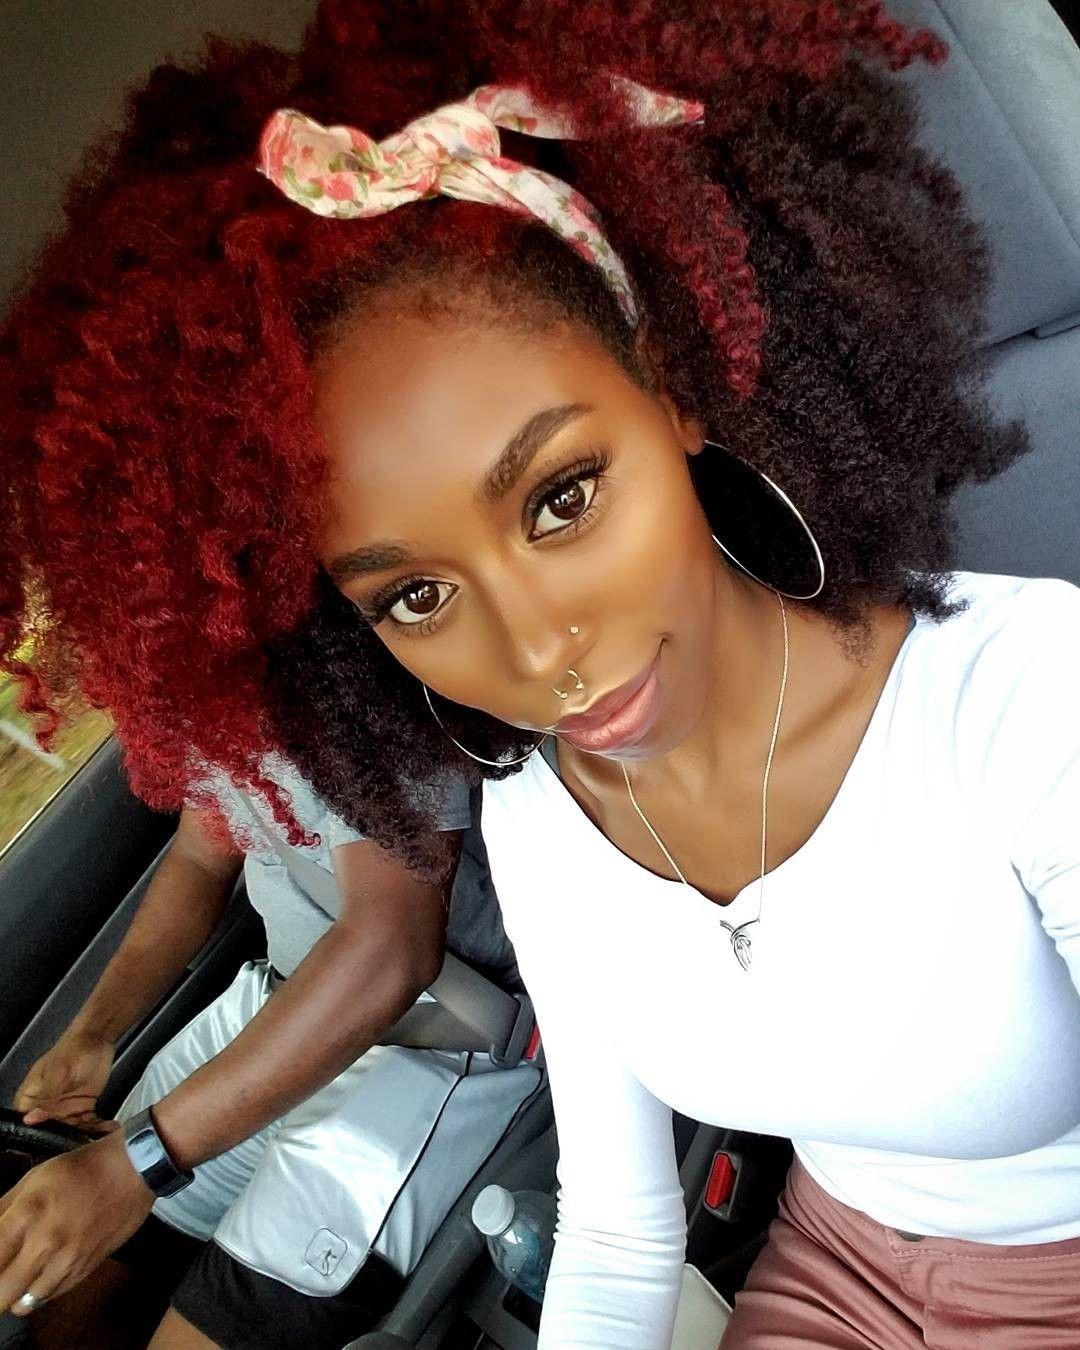 ONYC Tight Kinky Curlyfinally! - Black Hair Media Forum